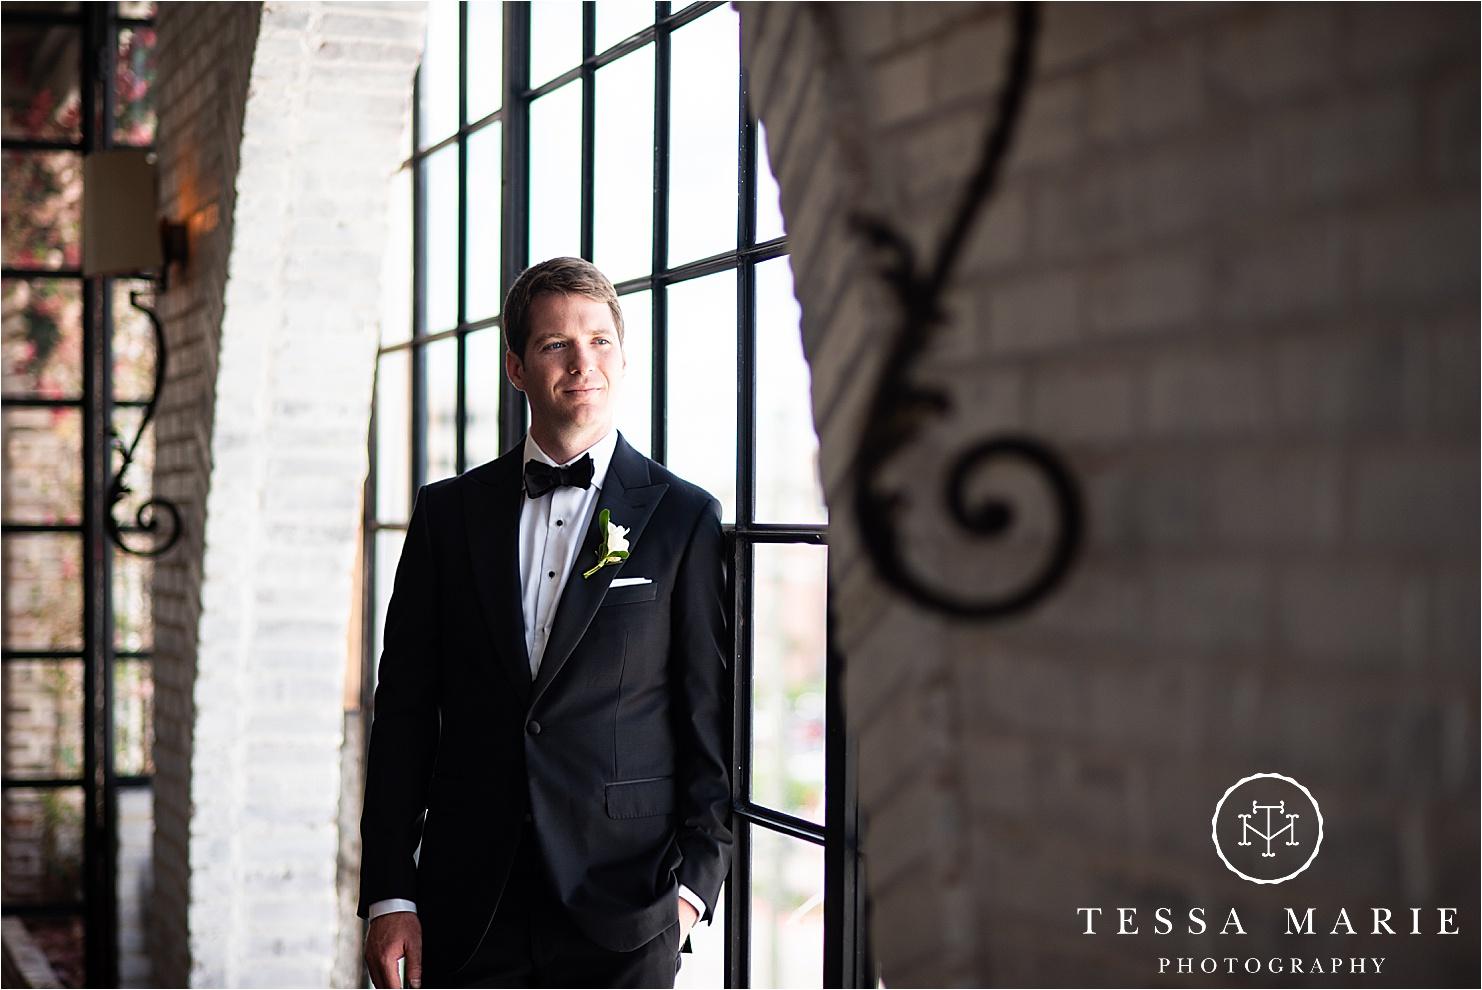 Tessa_marie_weddings_houston_wedding_photographer_The_astorian_0067.jpg